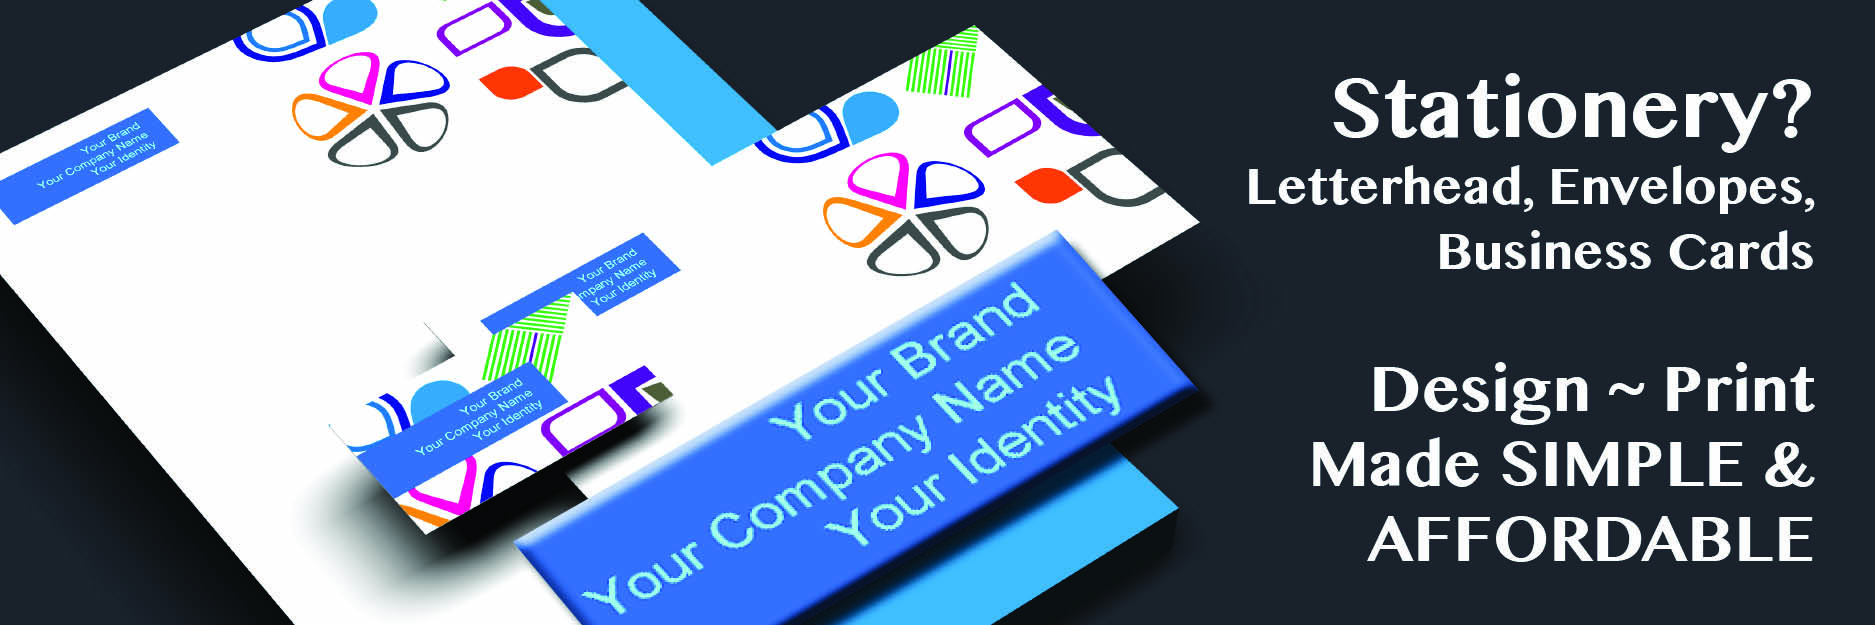 Stationery_Letterhead, Envelopes, Business Cards